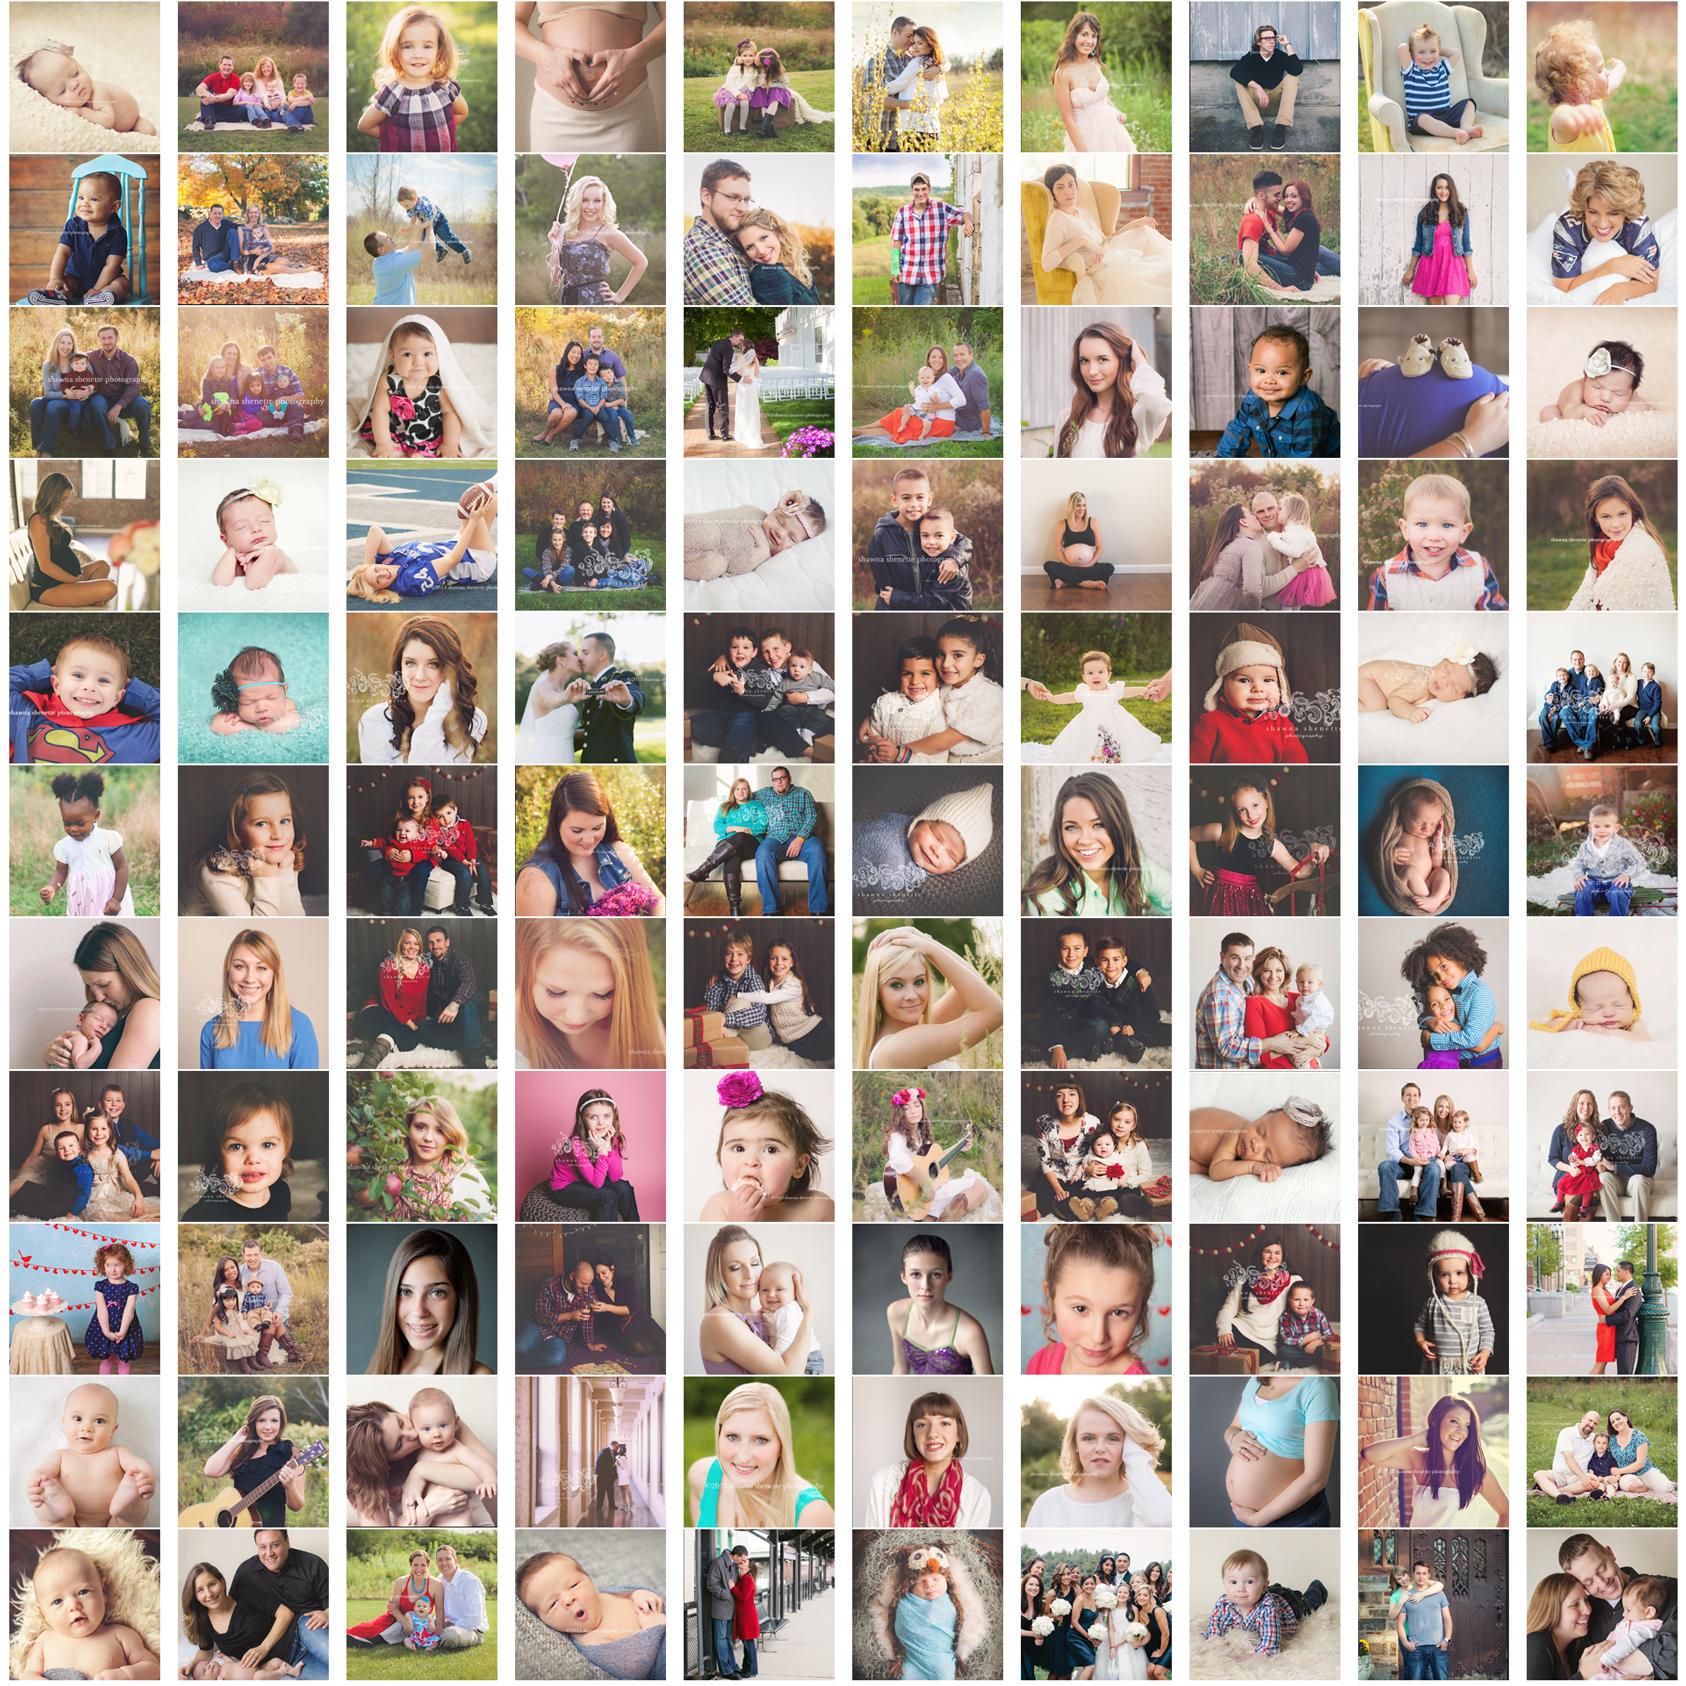 Massachusetts Photographer Newborn Maternity Senior Family Child Photos Commercial Child Photographer Worcester Millbury Auburn Shrewsbury Sutton Grafton